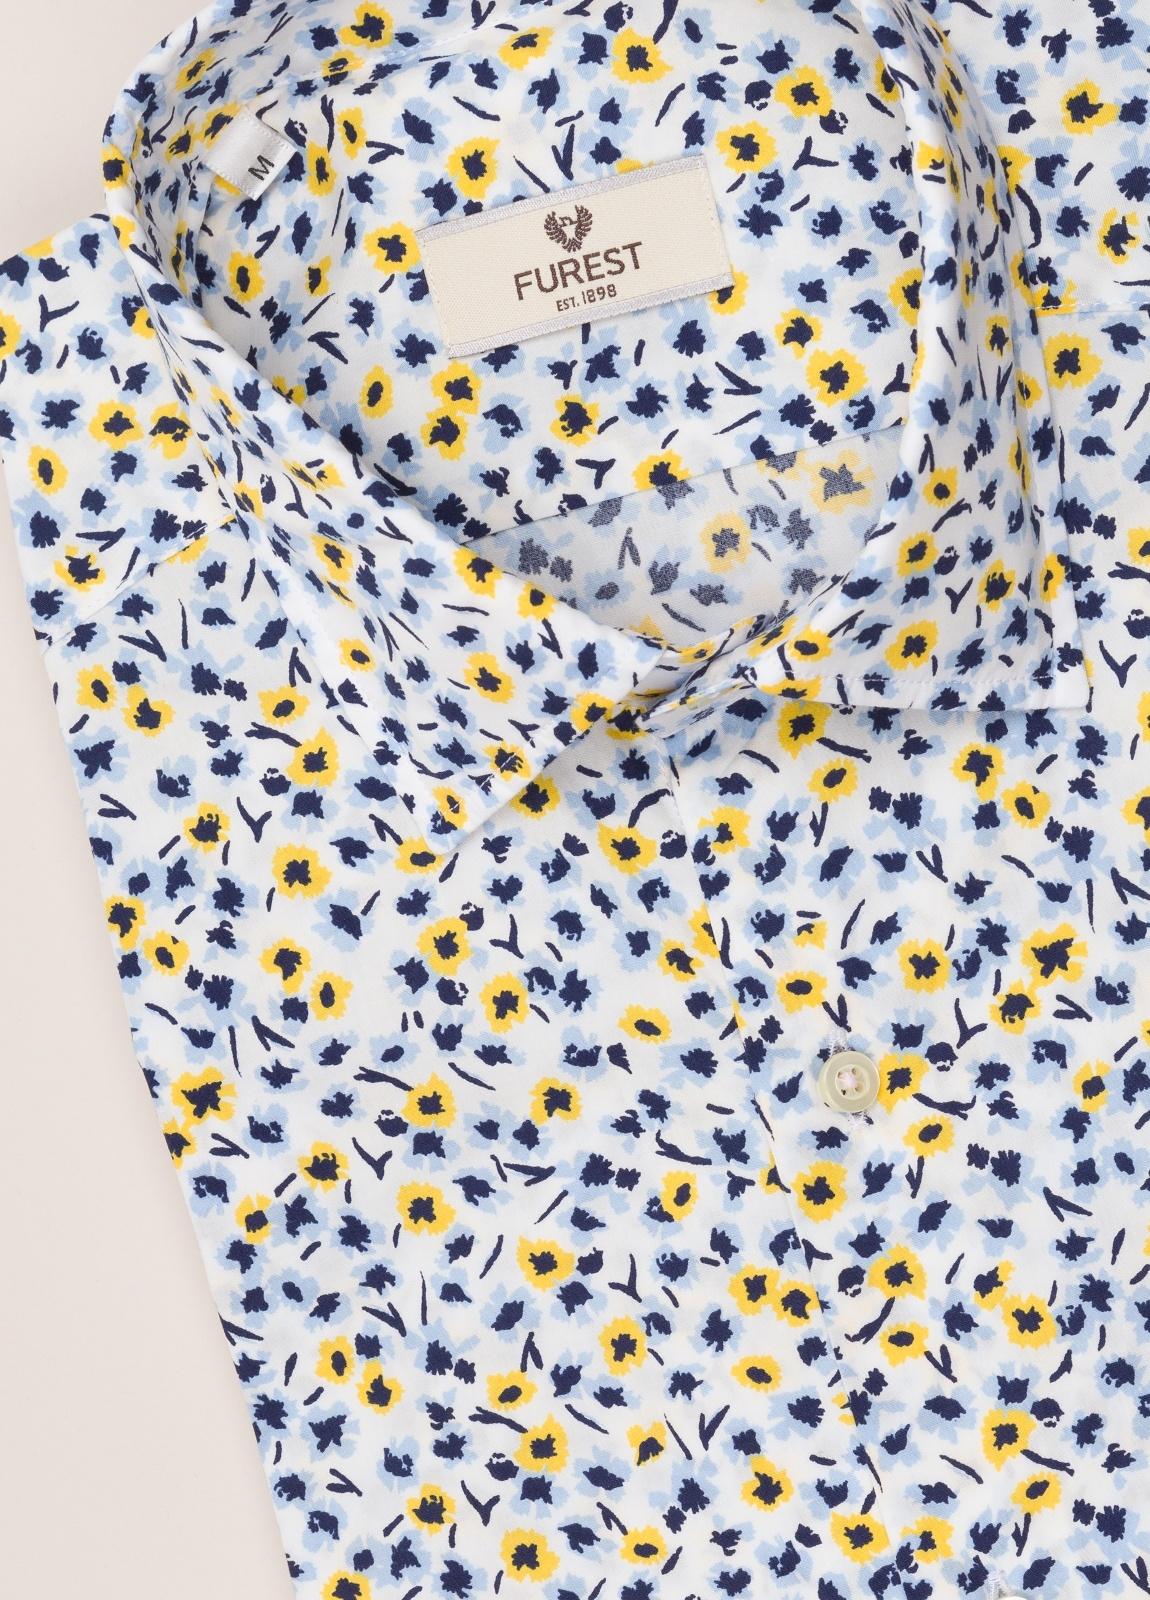 Camisa sport FUREST COLECCIÓN Slim Fit flores amarillo - Ítem2